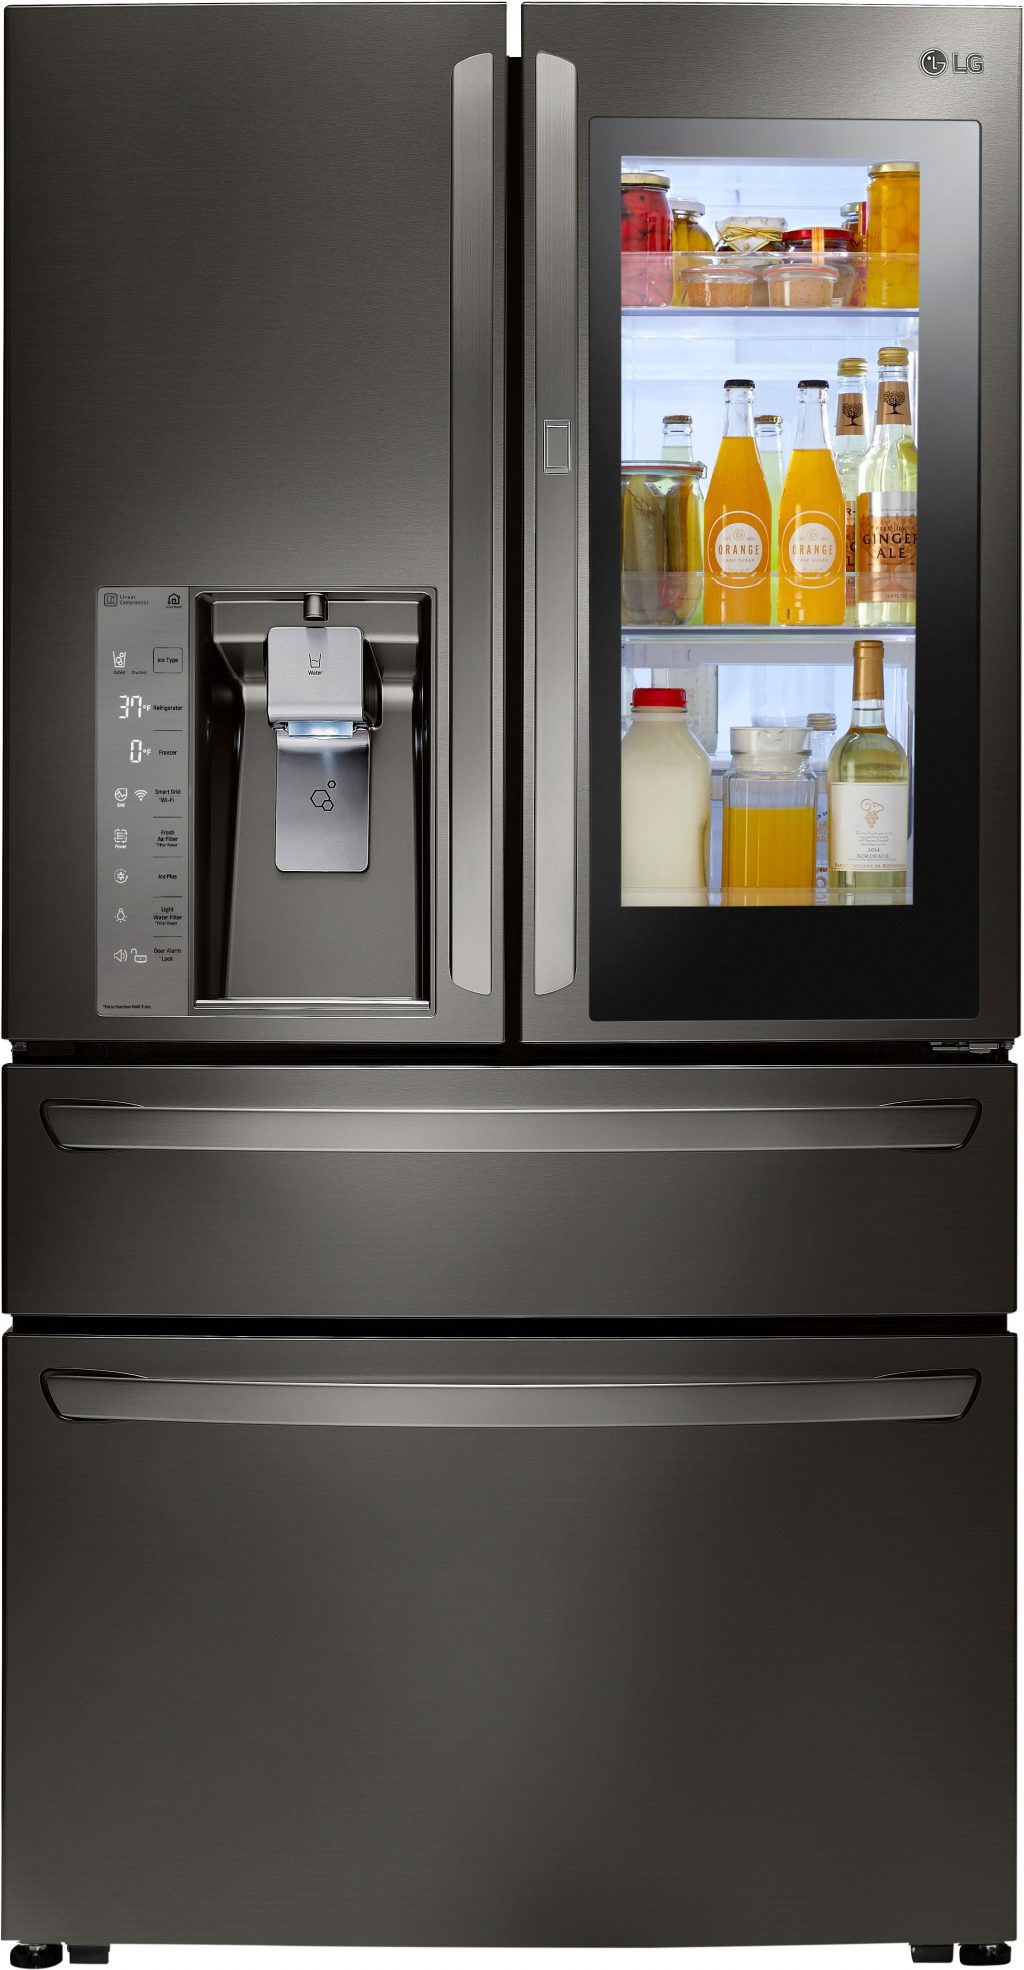 LG InstaView Refrigerator from Best Buy